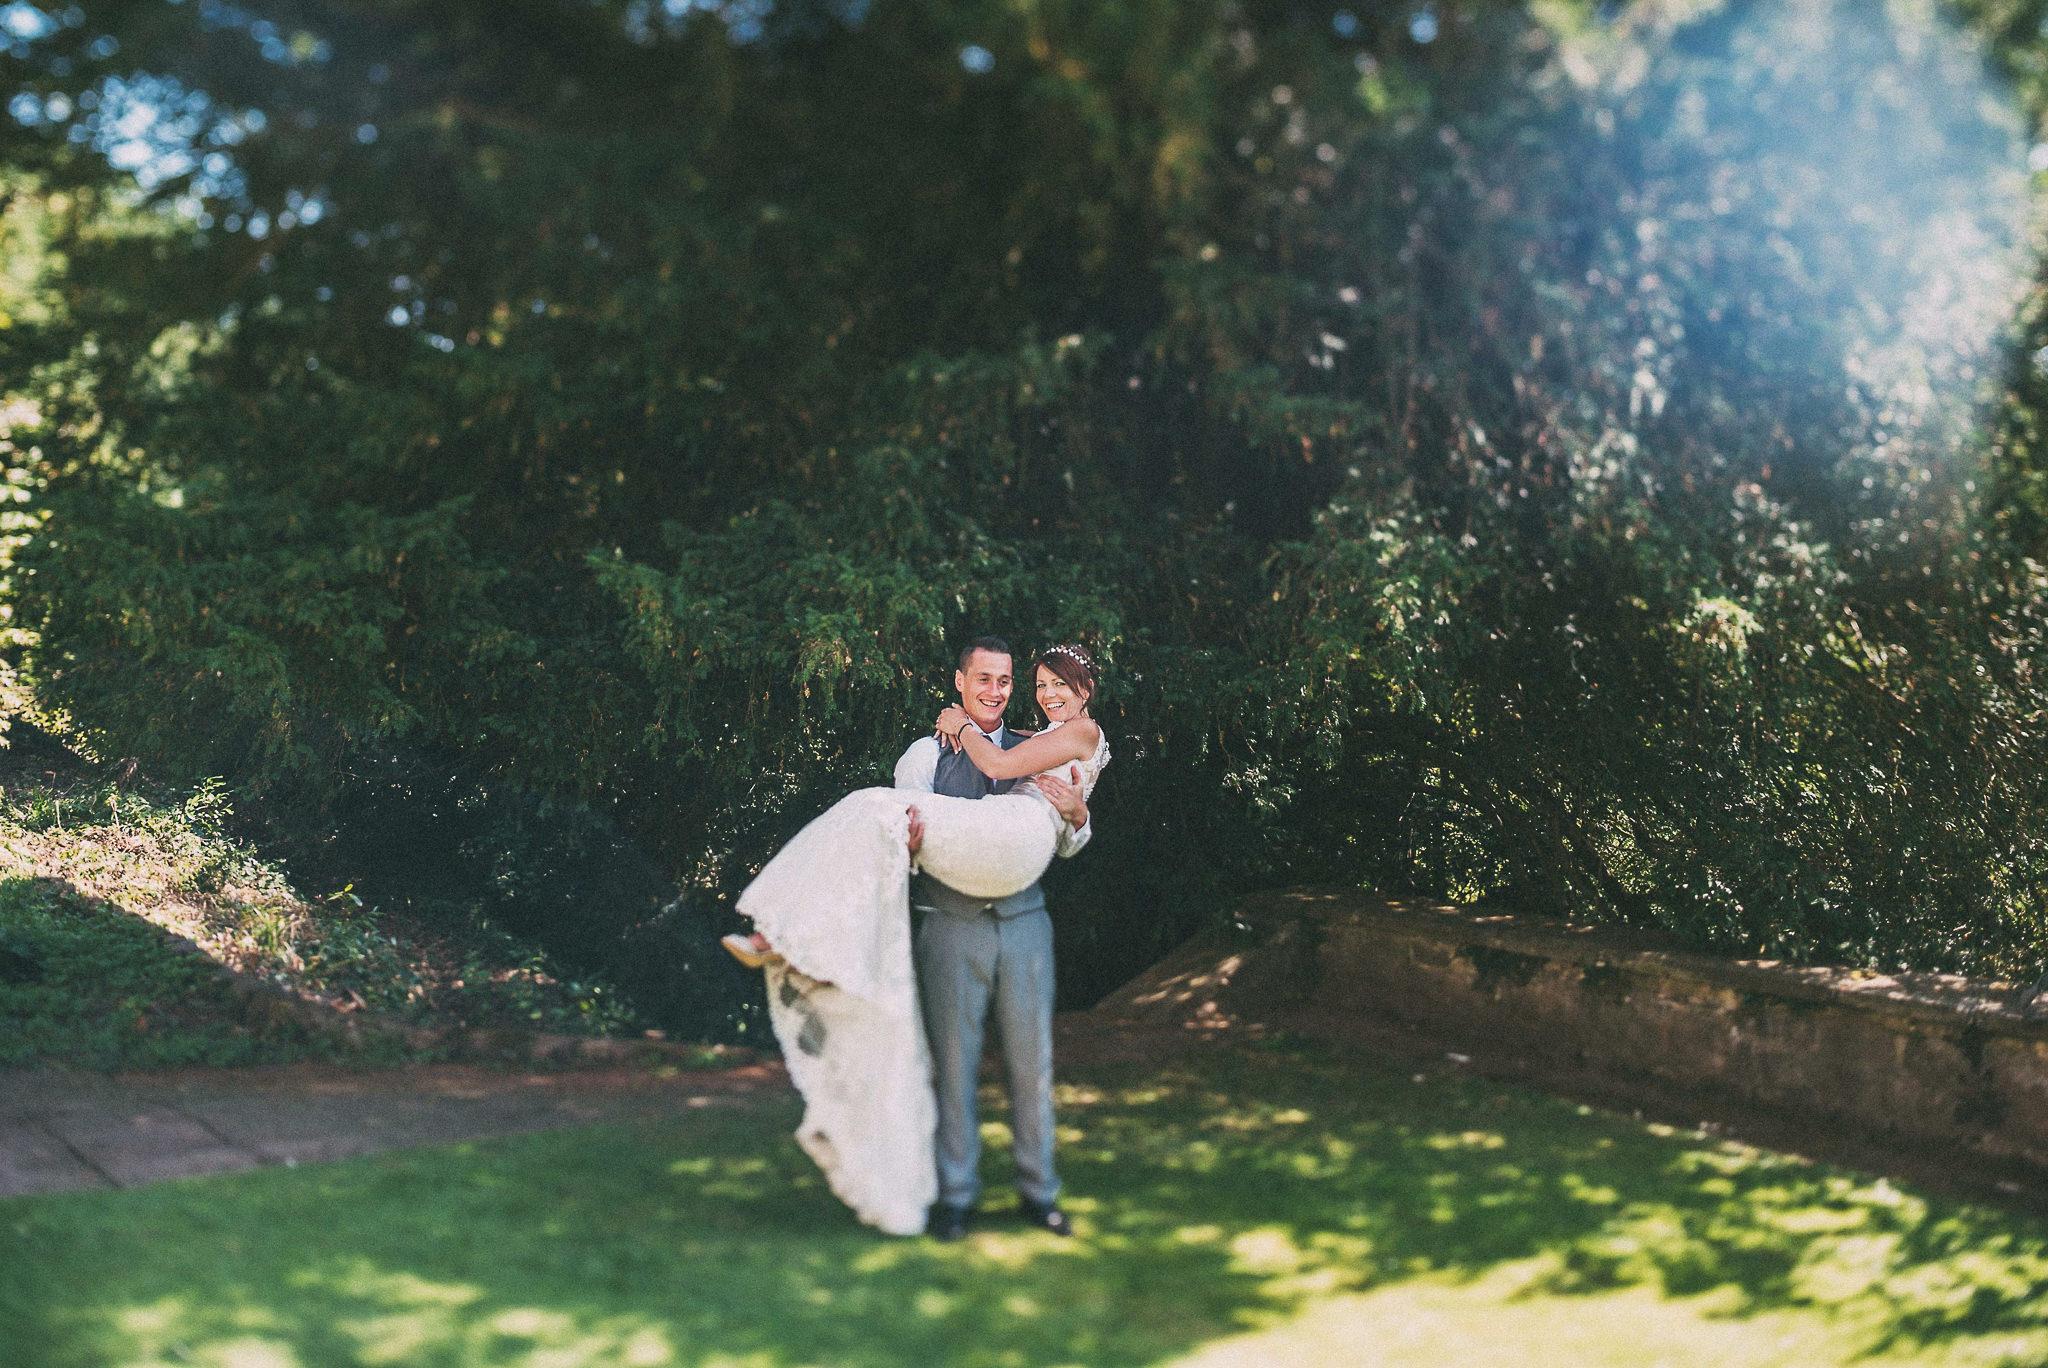 paul-marbrook-Caer-Llan-Wedding-Photographer-90066